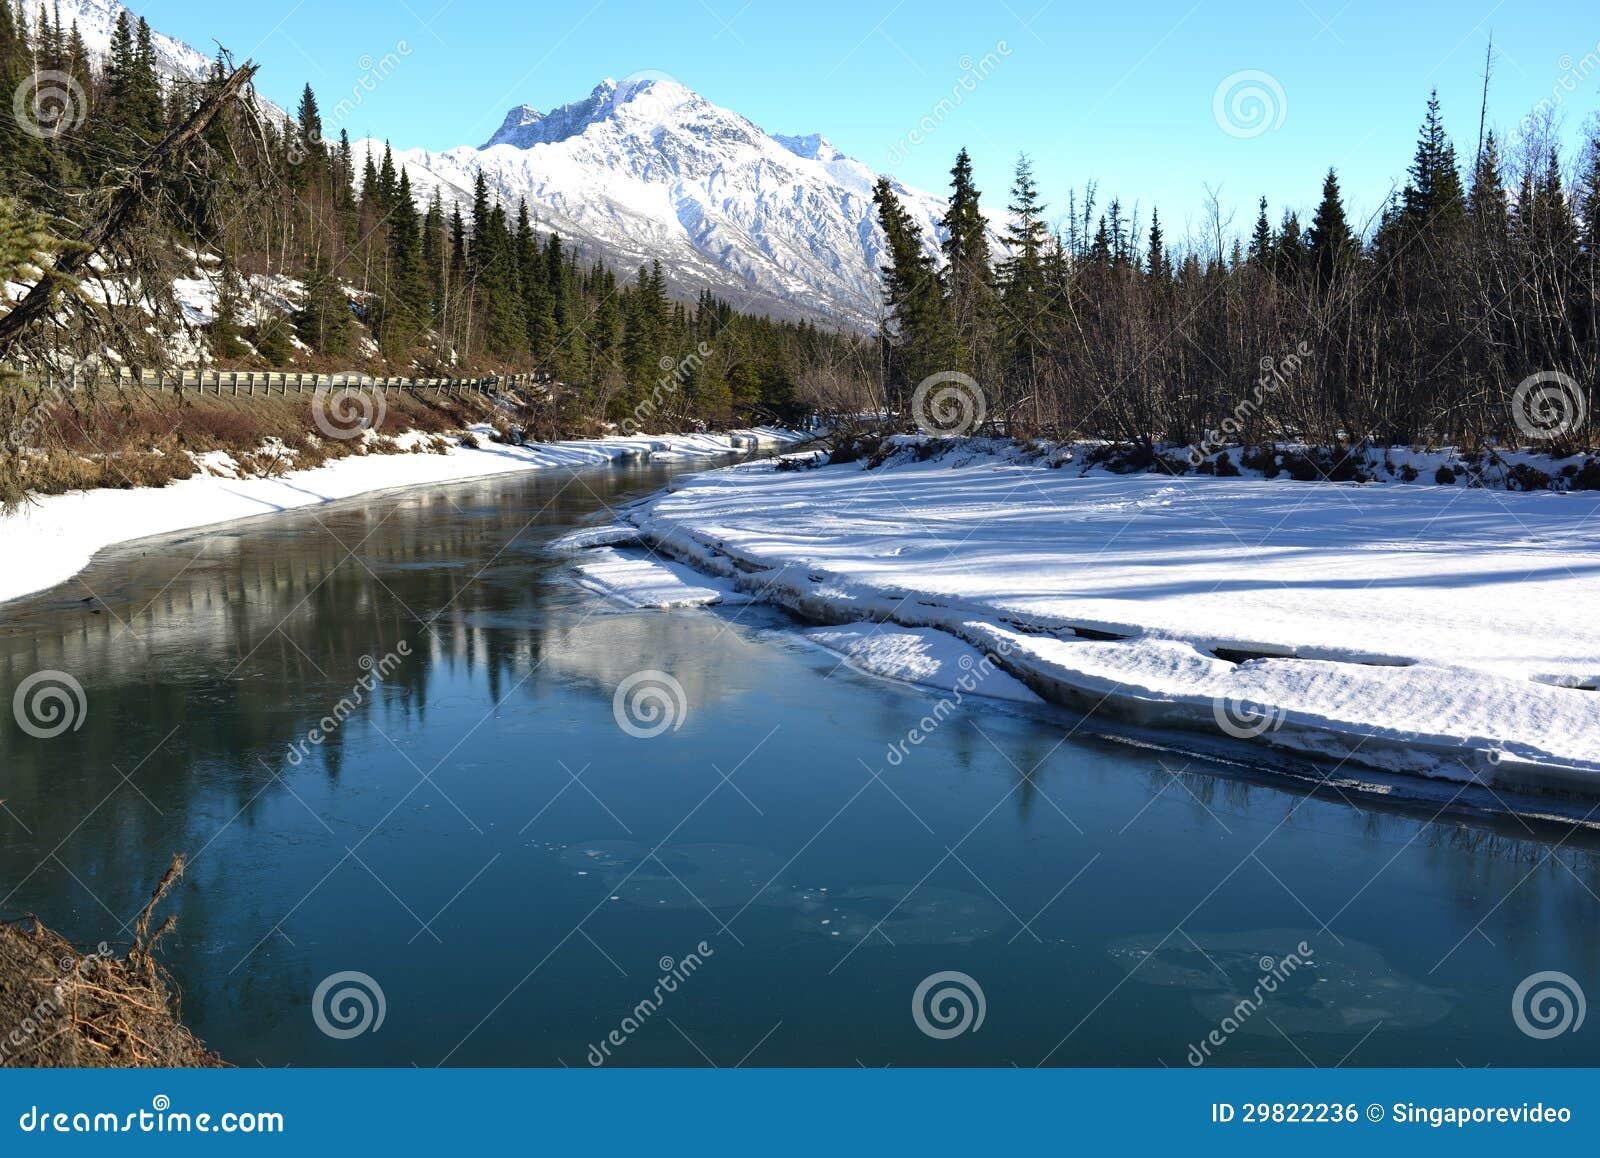 Camino a Eagle River Park, Alaska